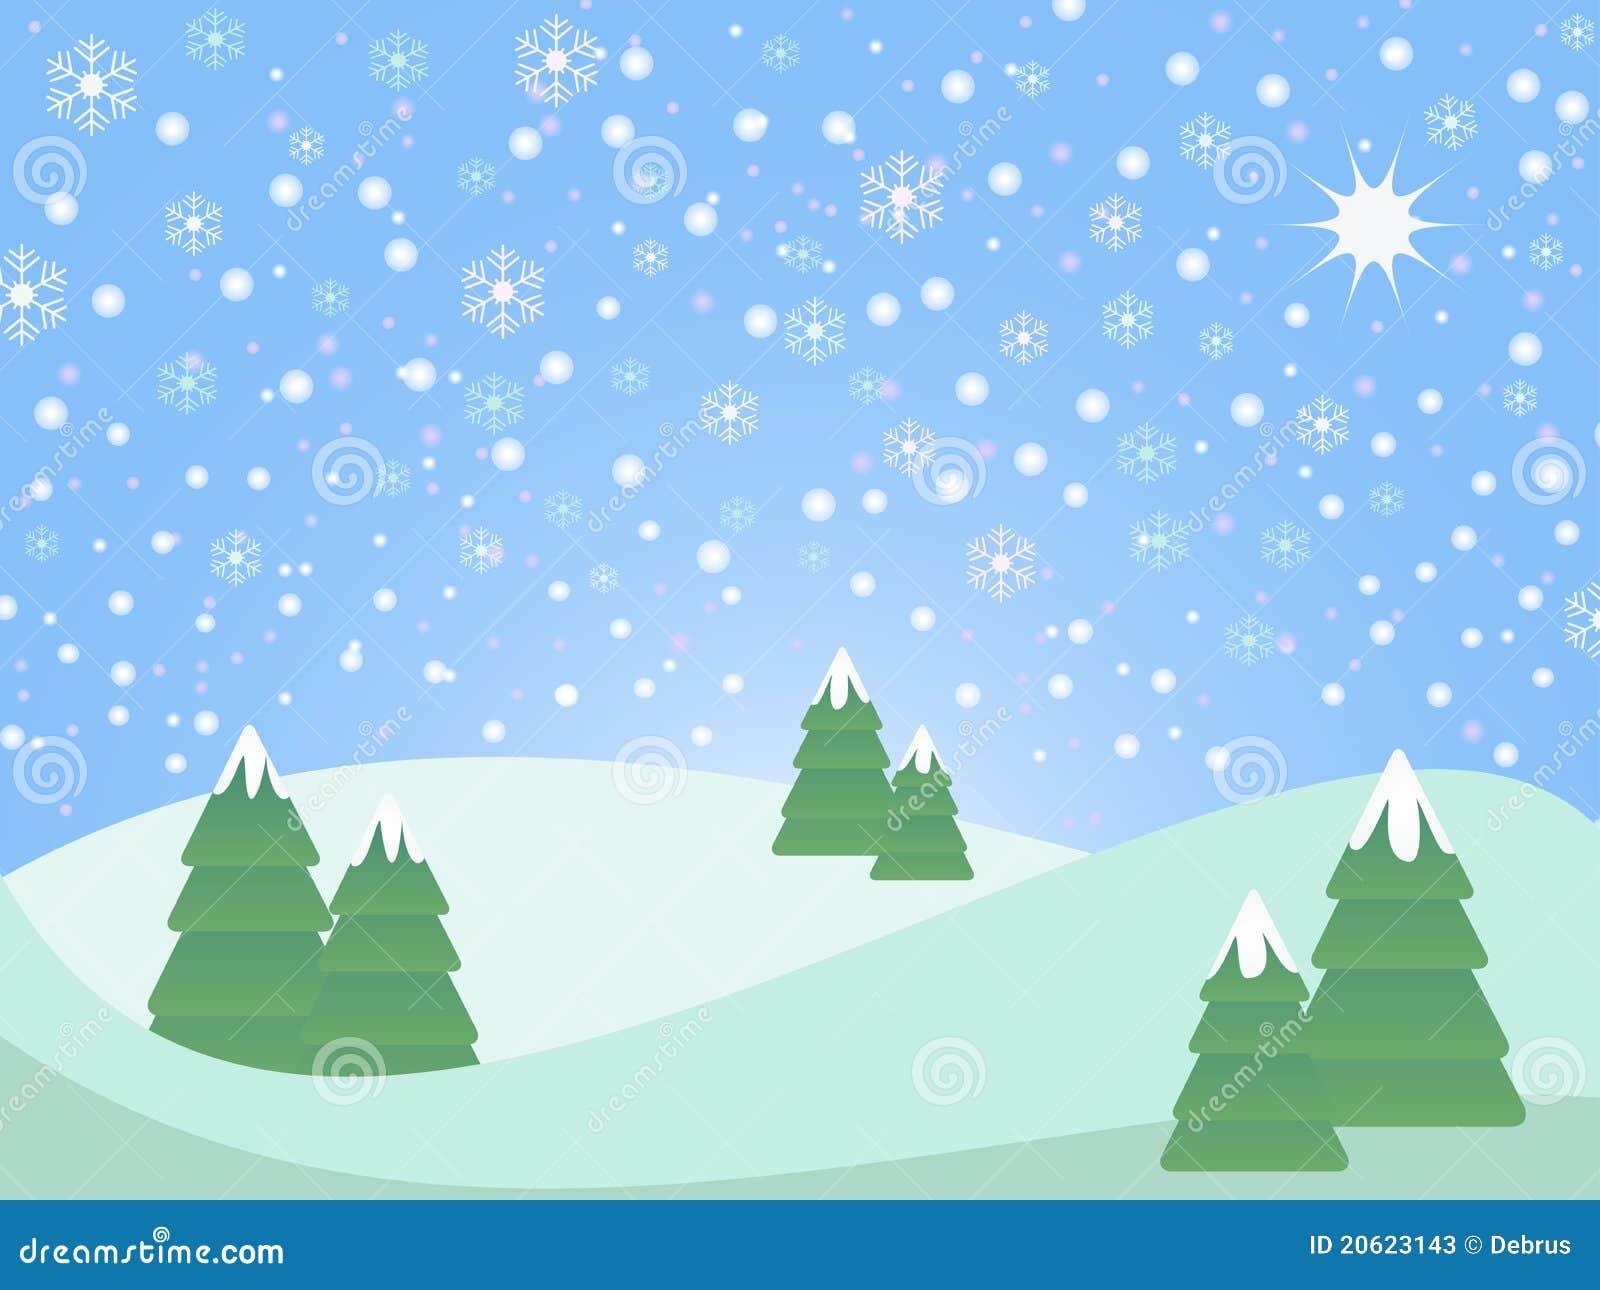 Snowy Christmas Landscape Stock Illustration Illustration Of White